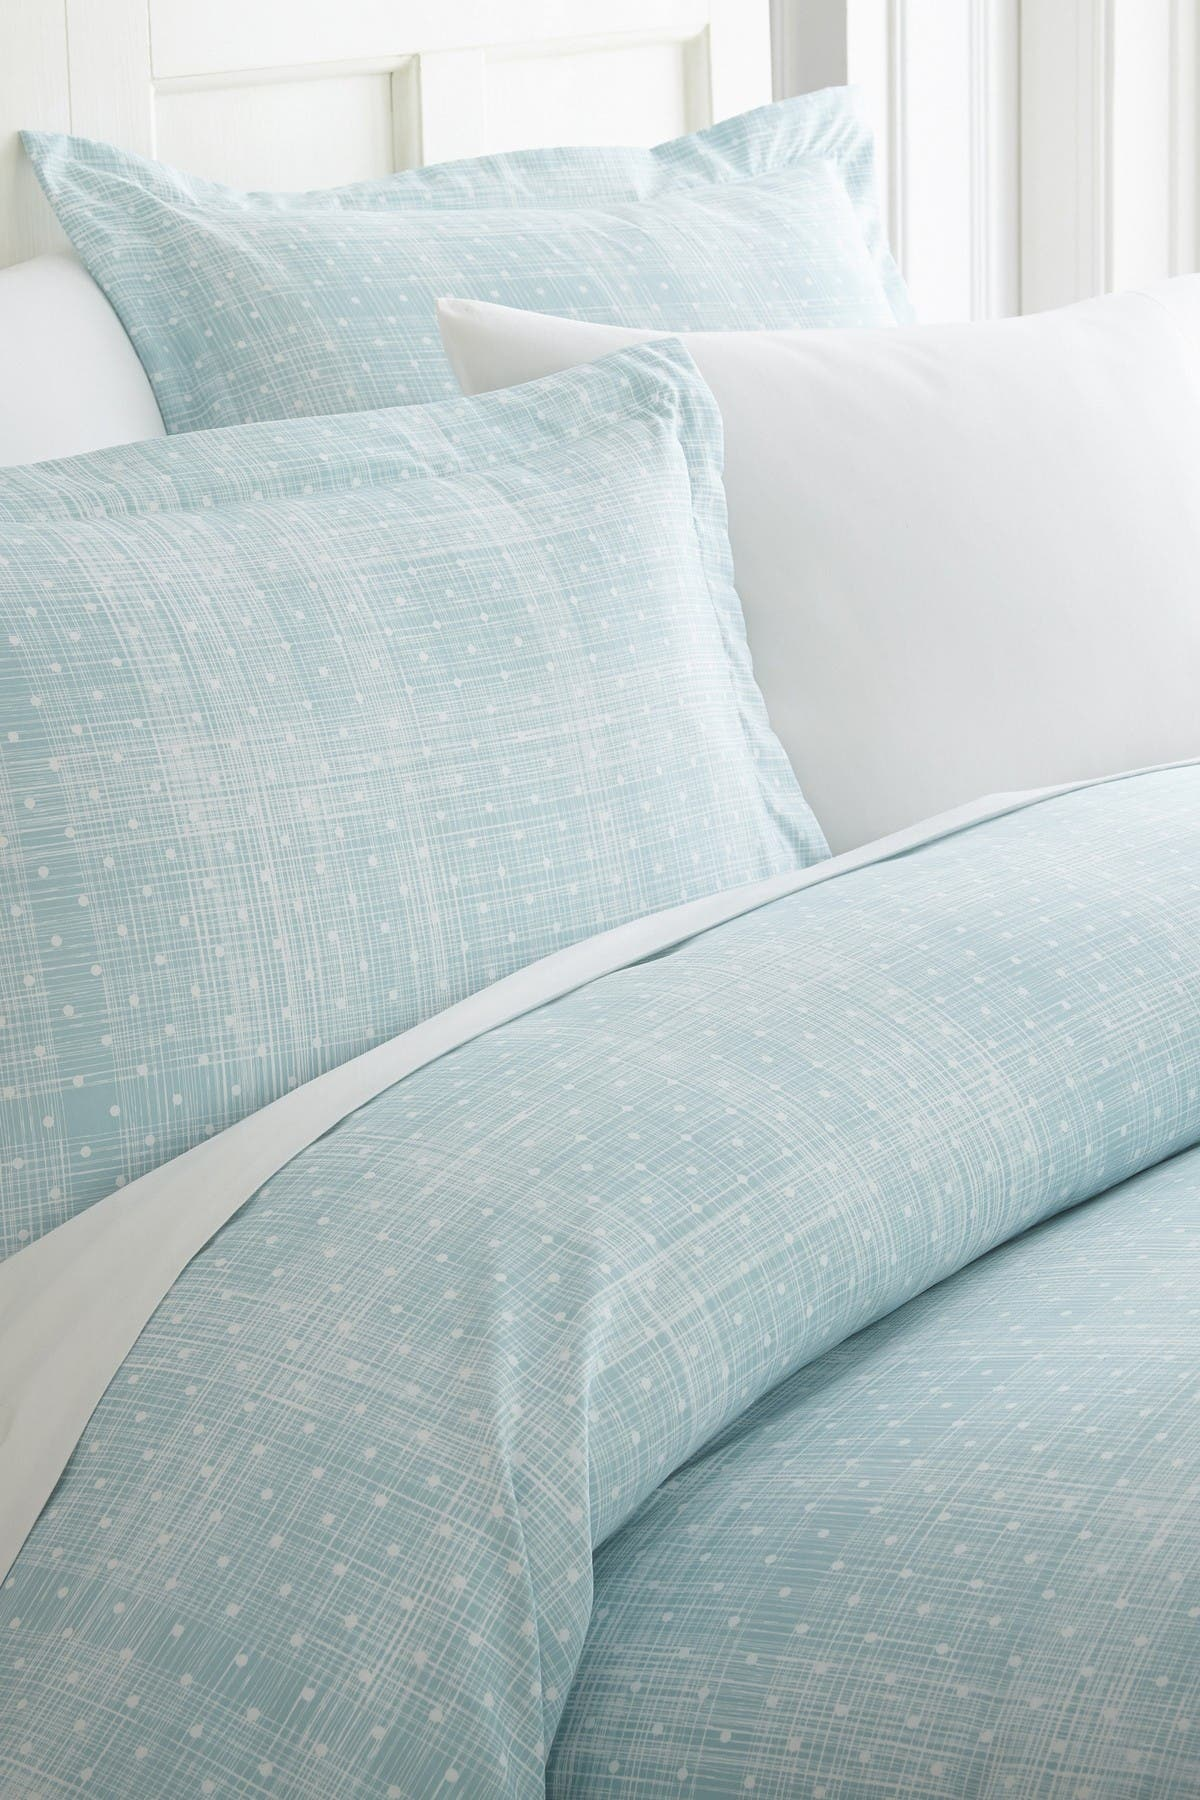 Ienjoy Home Home Spun Premium Ultra Soft Polka Dot Pattern 3-piece Duvet Cover King Set In Aqua